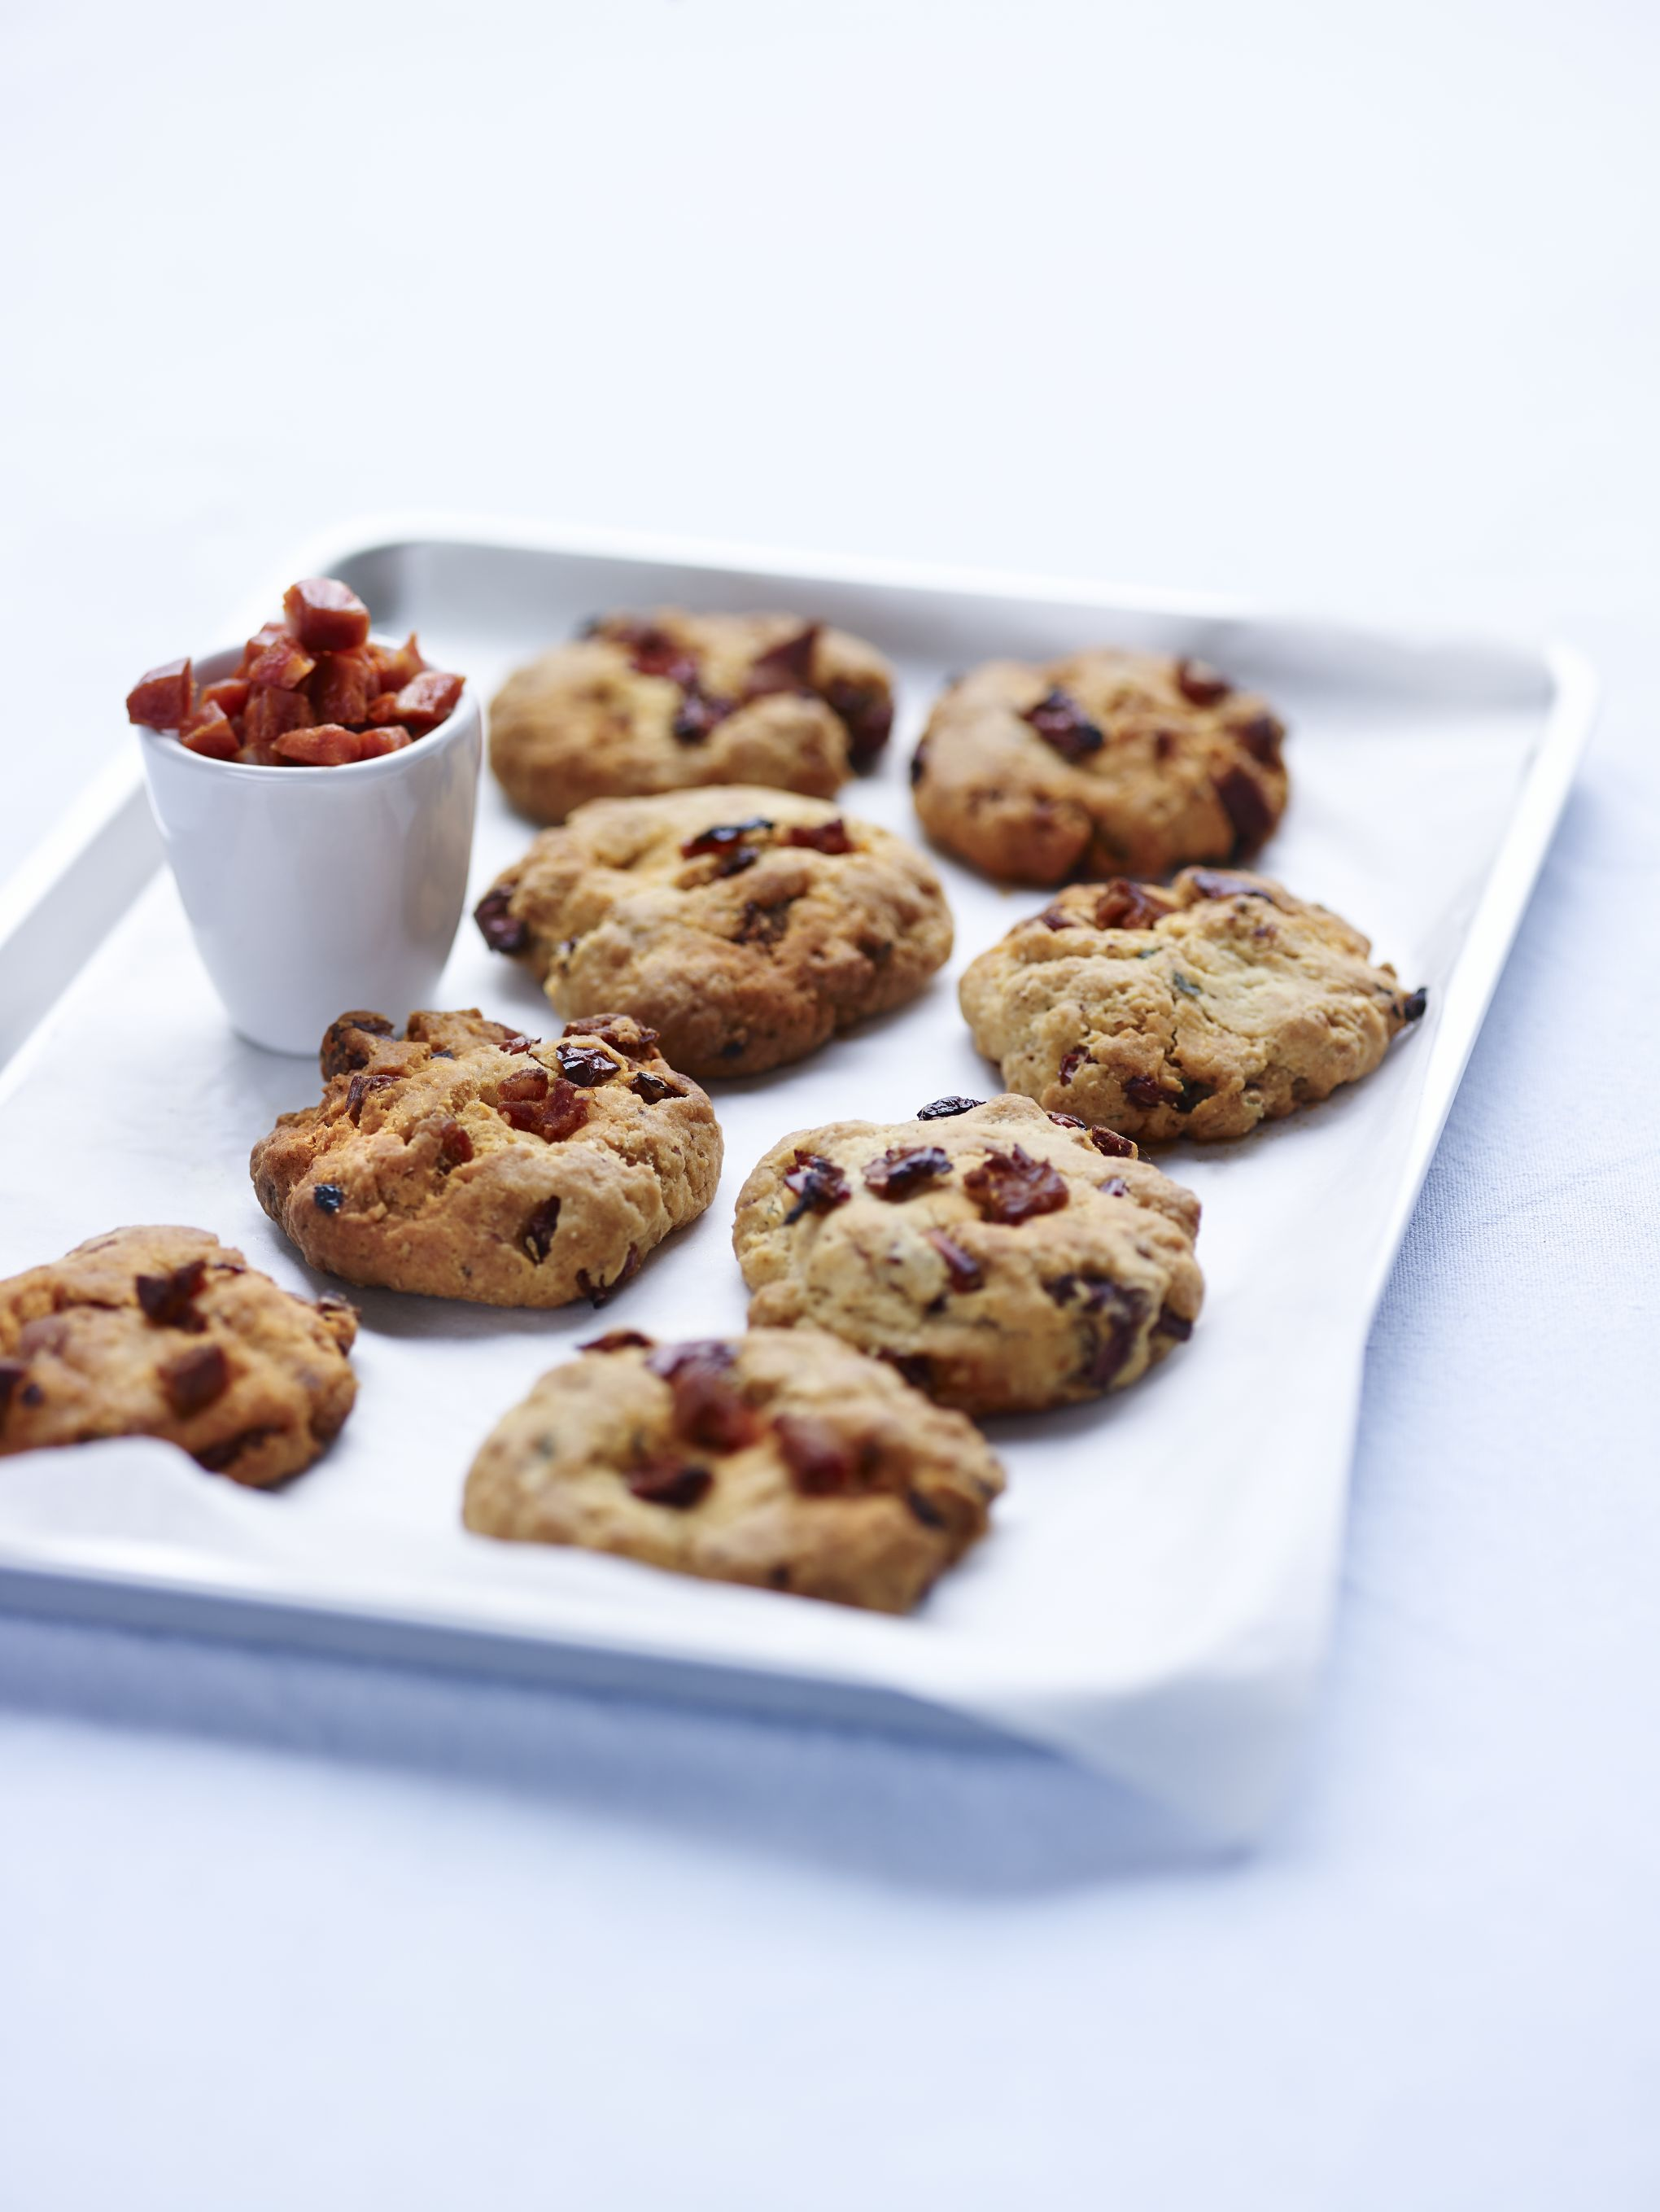 AOSTE - Cookies Chorizo (c)Jean-Claude Amiel